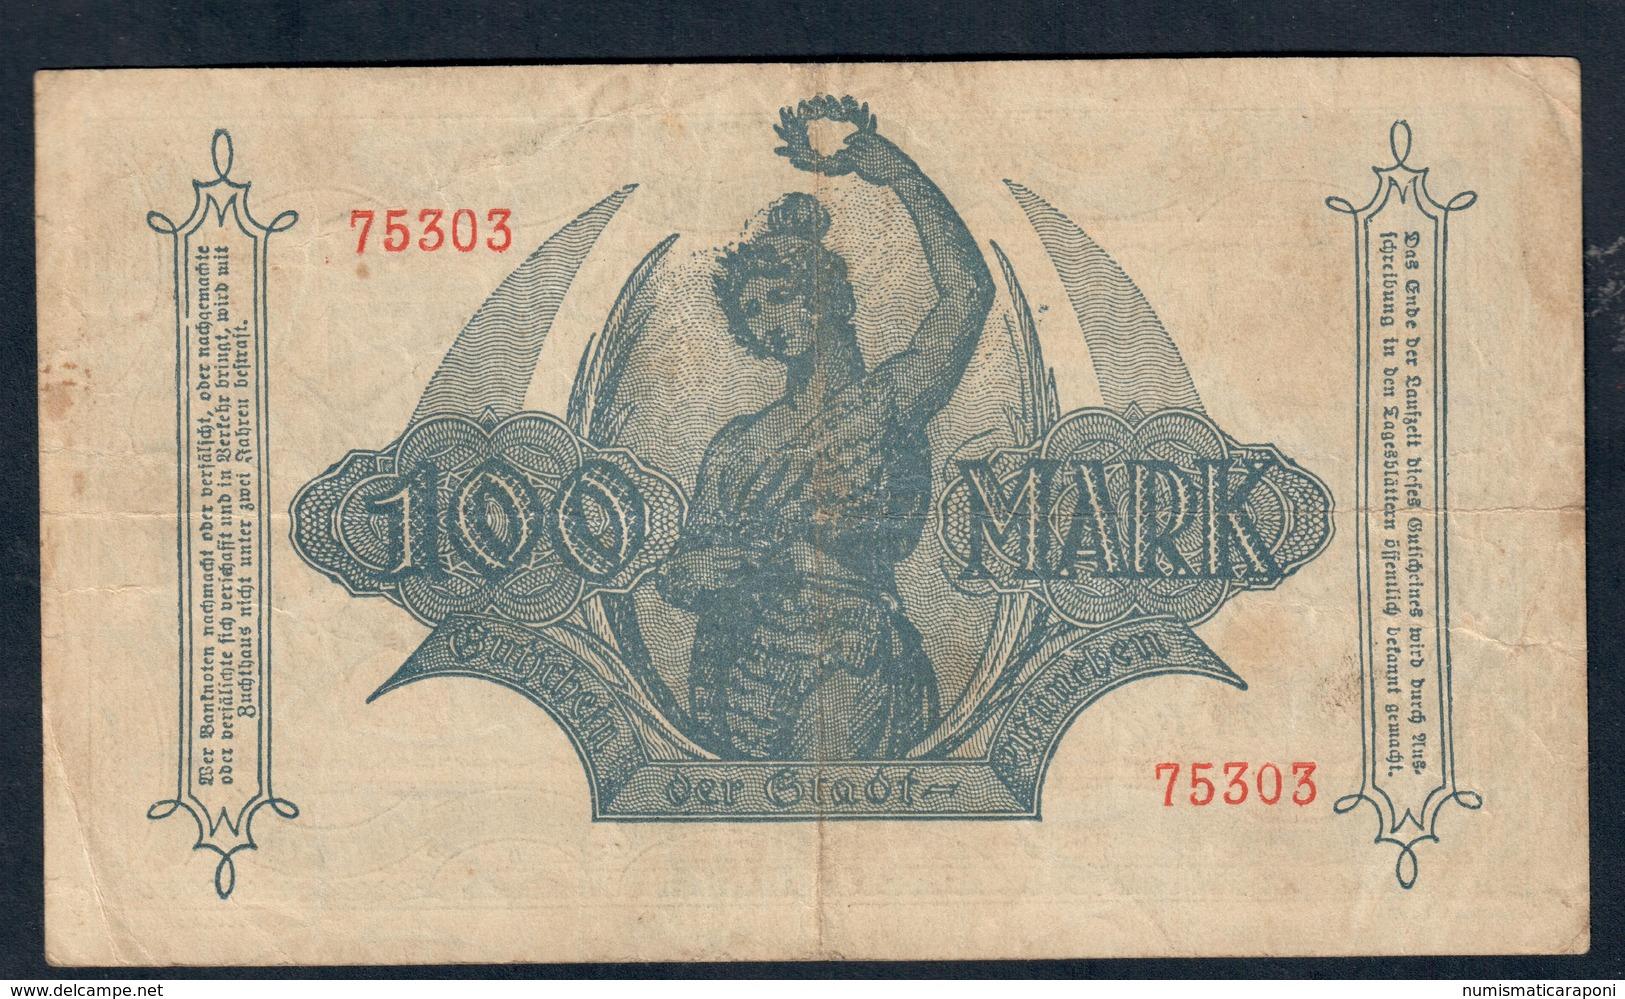 GERMANIA ALEMANIA GERMANY Notgeld Munchen 100 Mark 1922 Lotto 085 - [ 3] 1918-1933 : Weimar Republic